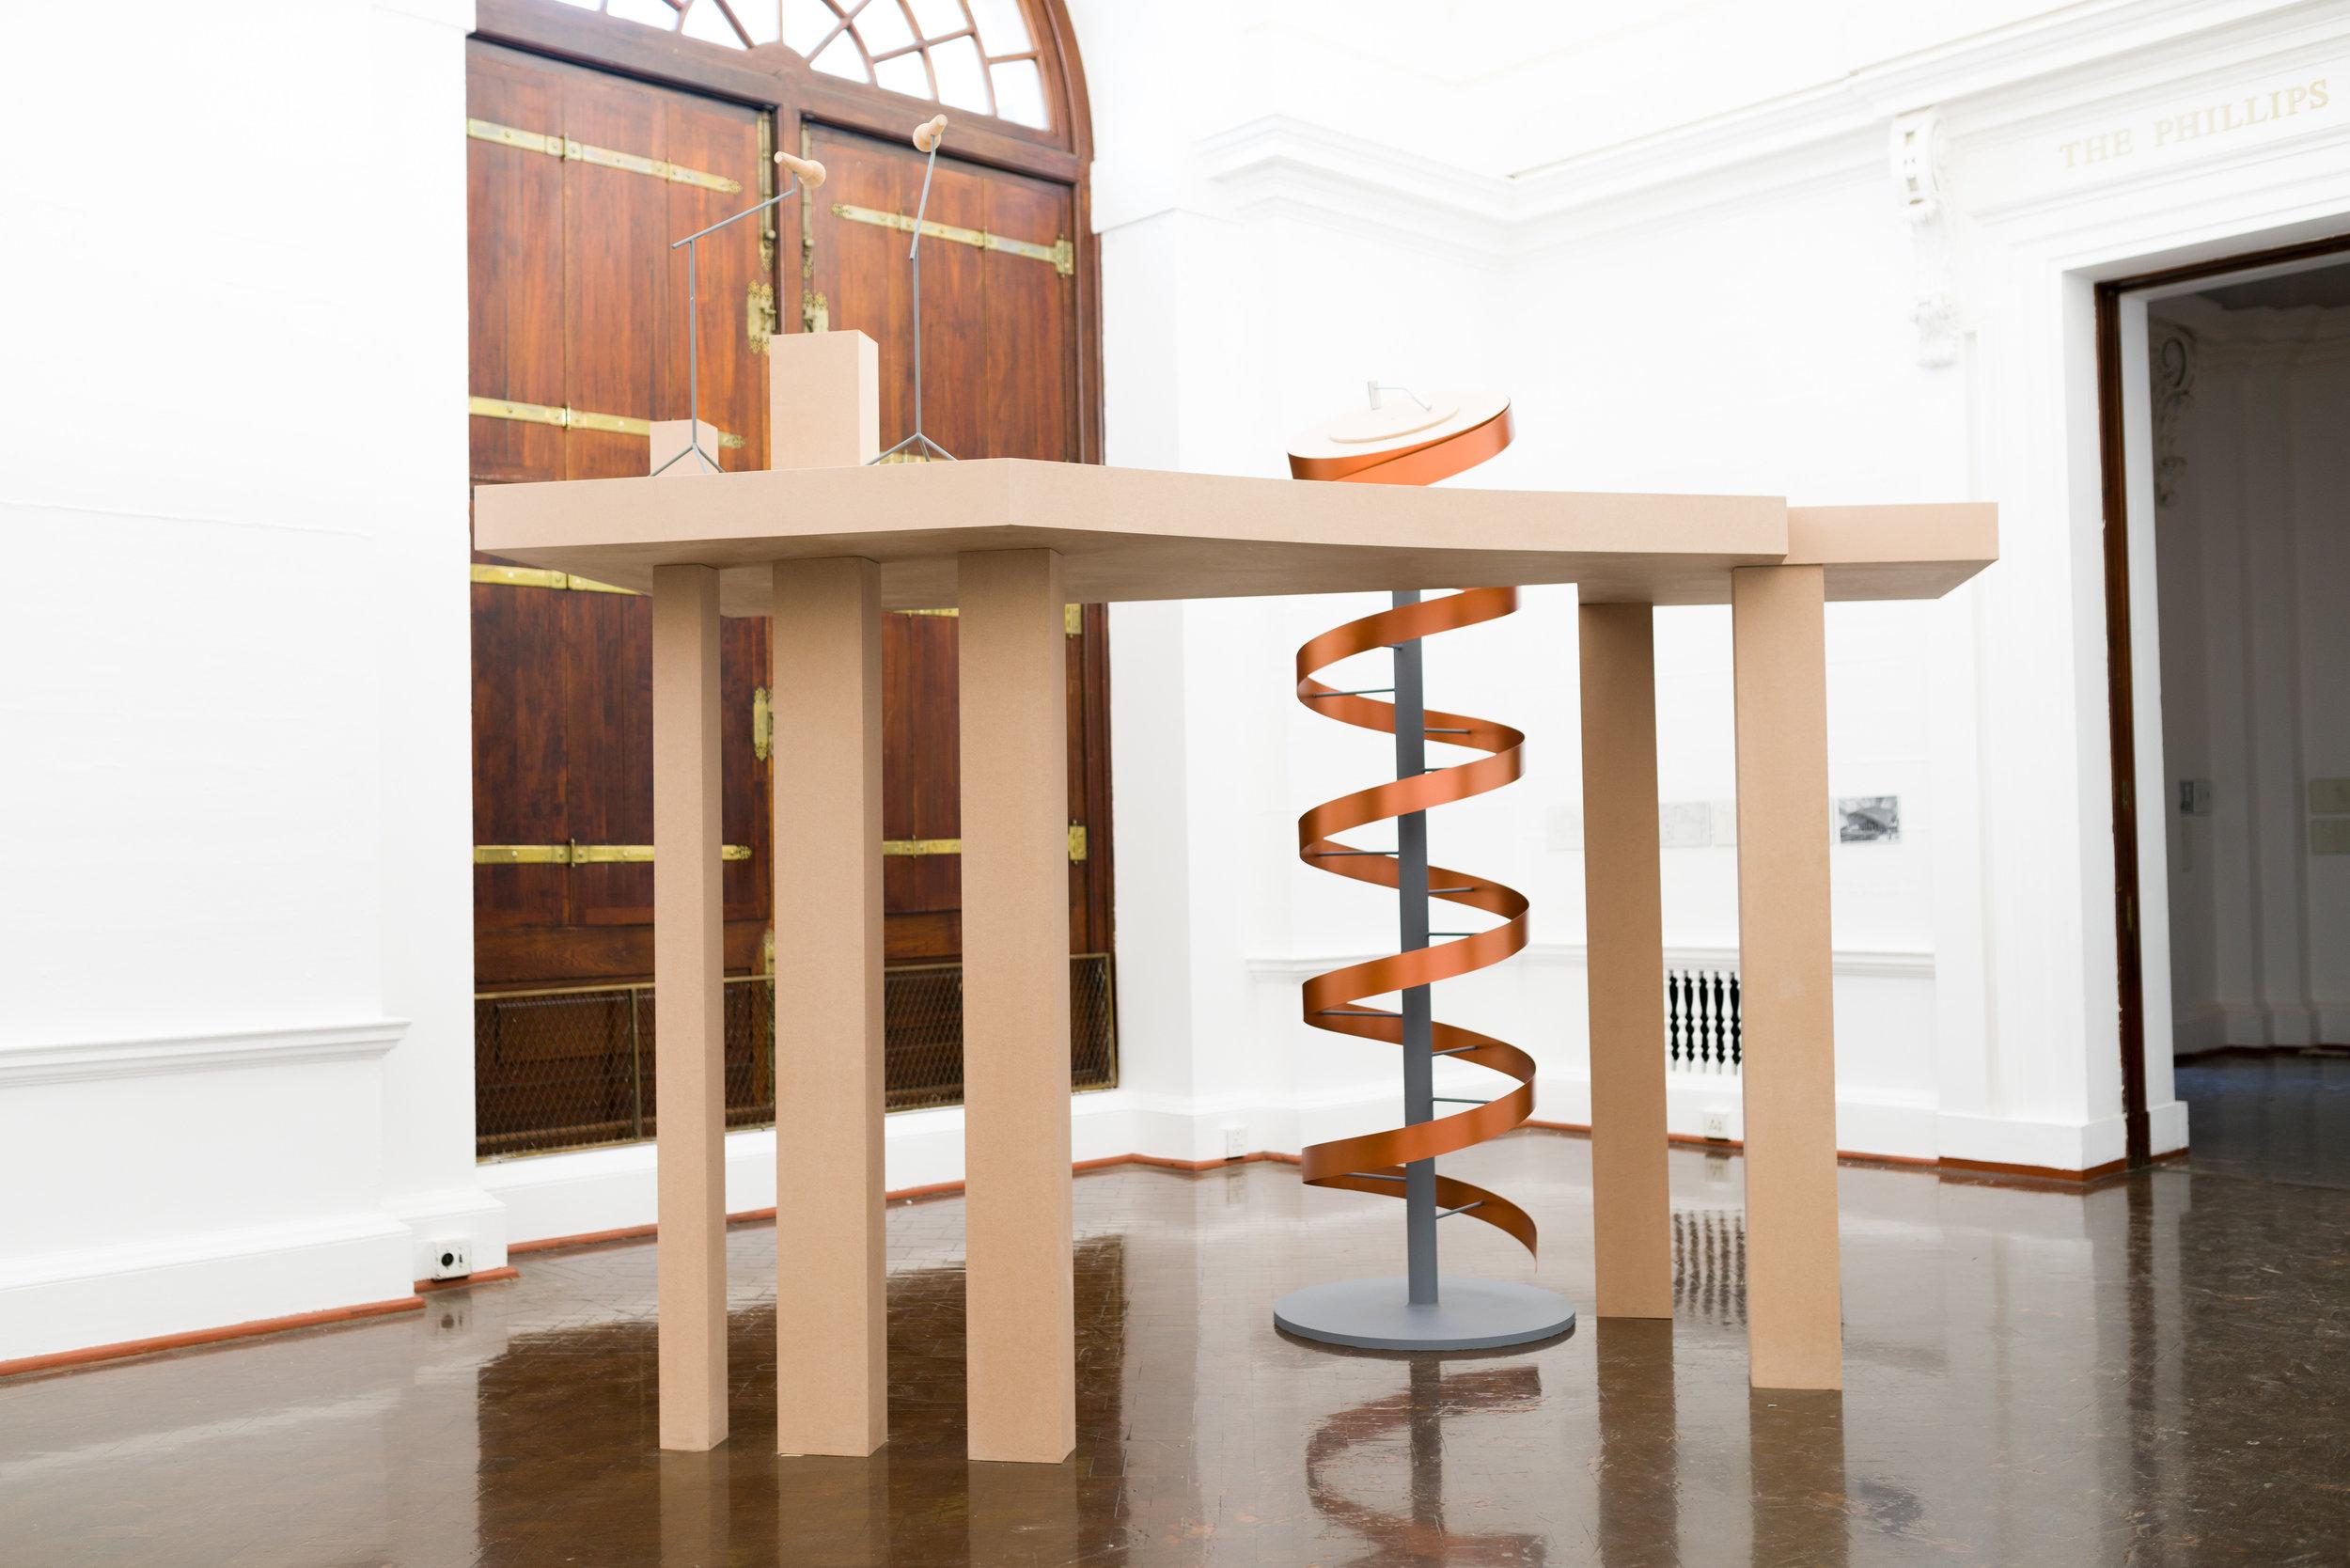 Ângela Ferreira, Remining (Drill tower)